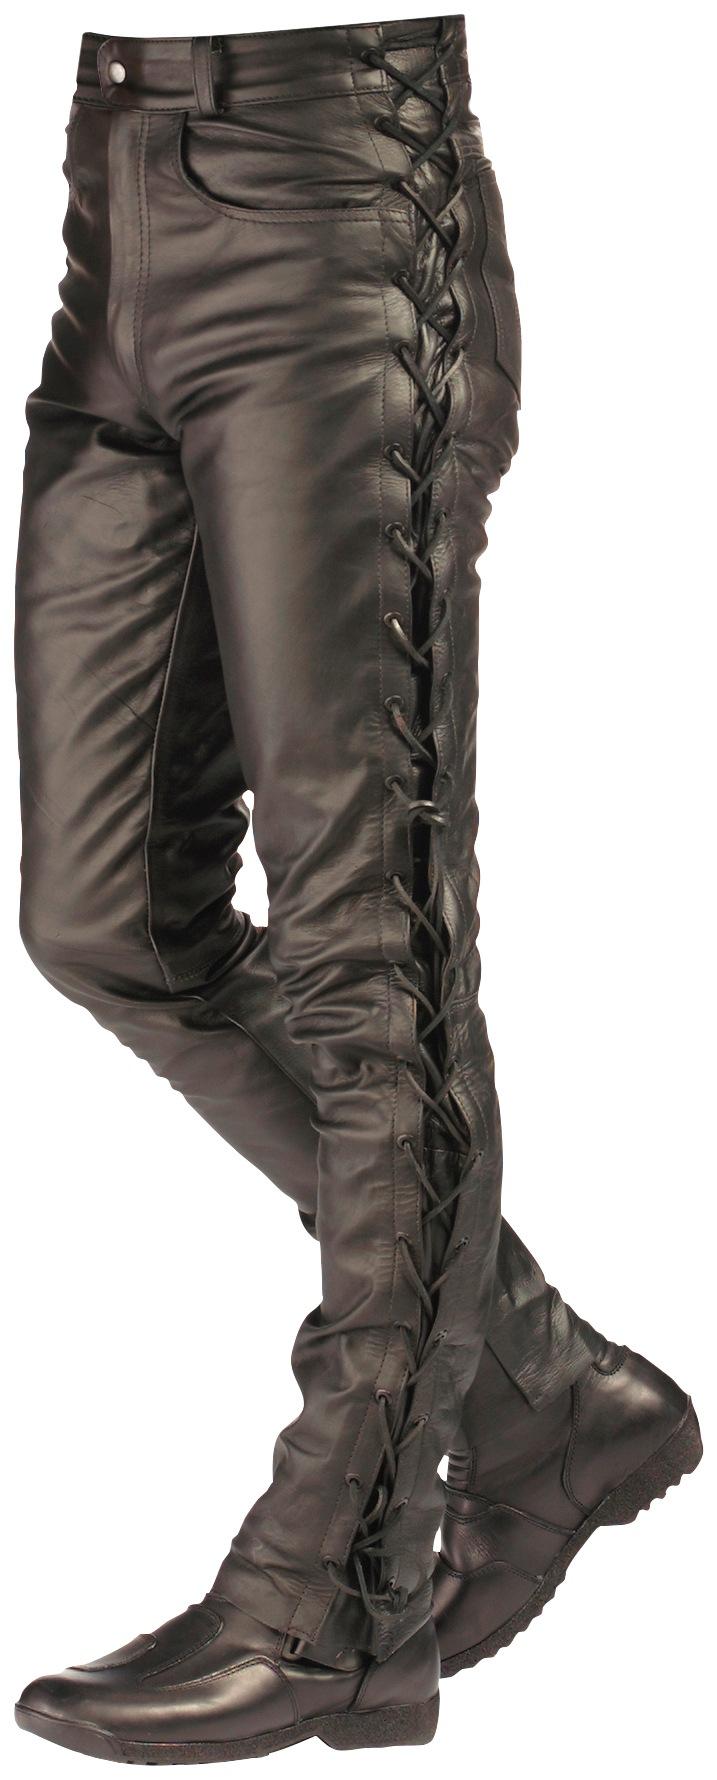 ROLEFF Motorradhose »RO 3«   Bekleidung > Hosen > Sonstige Hosen   Schwarz   Leder   ROLEFF